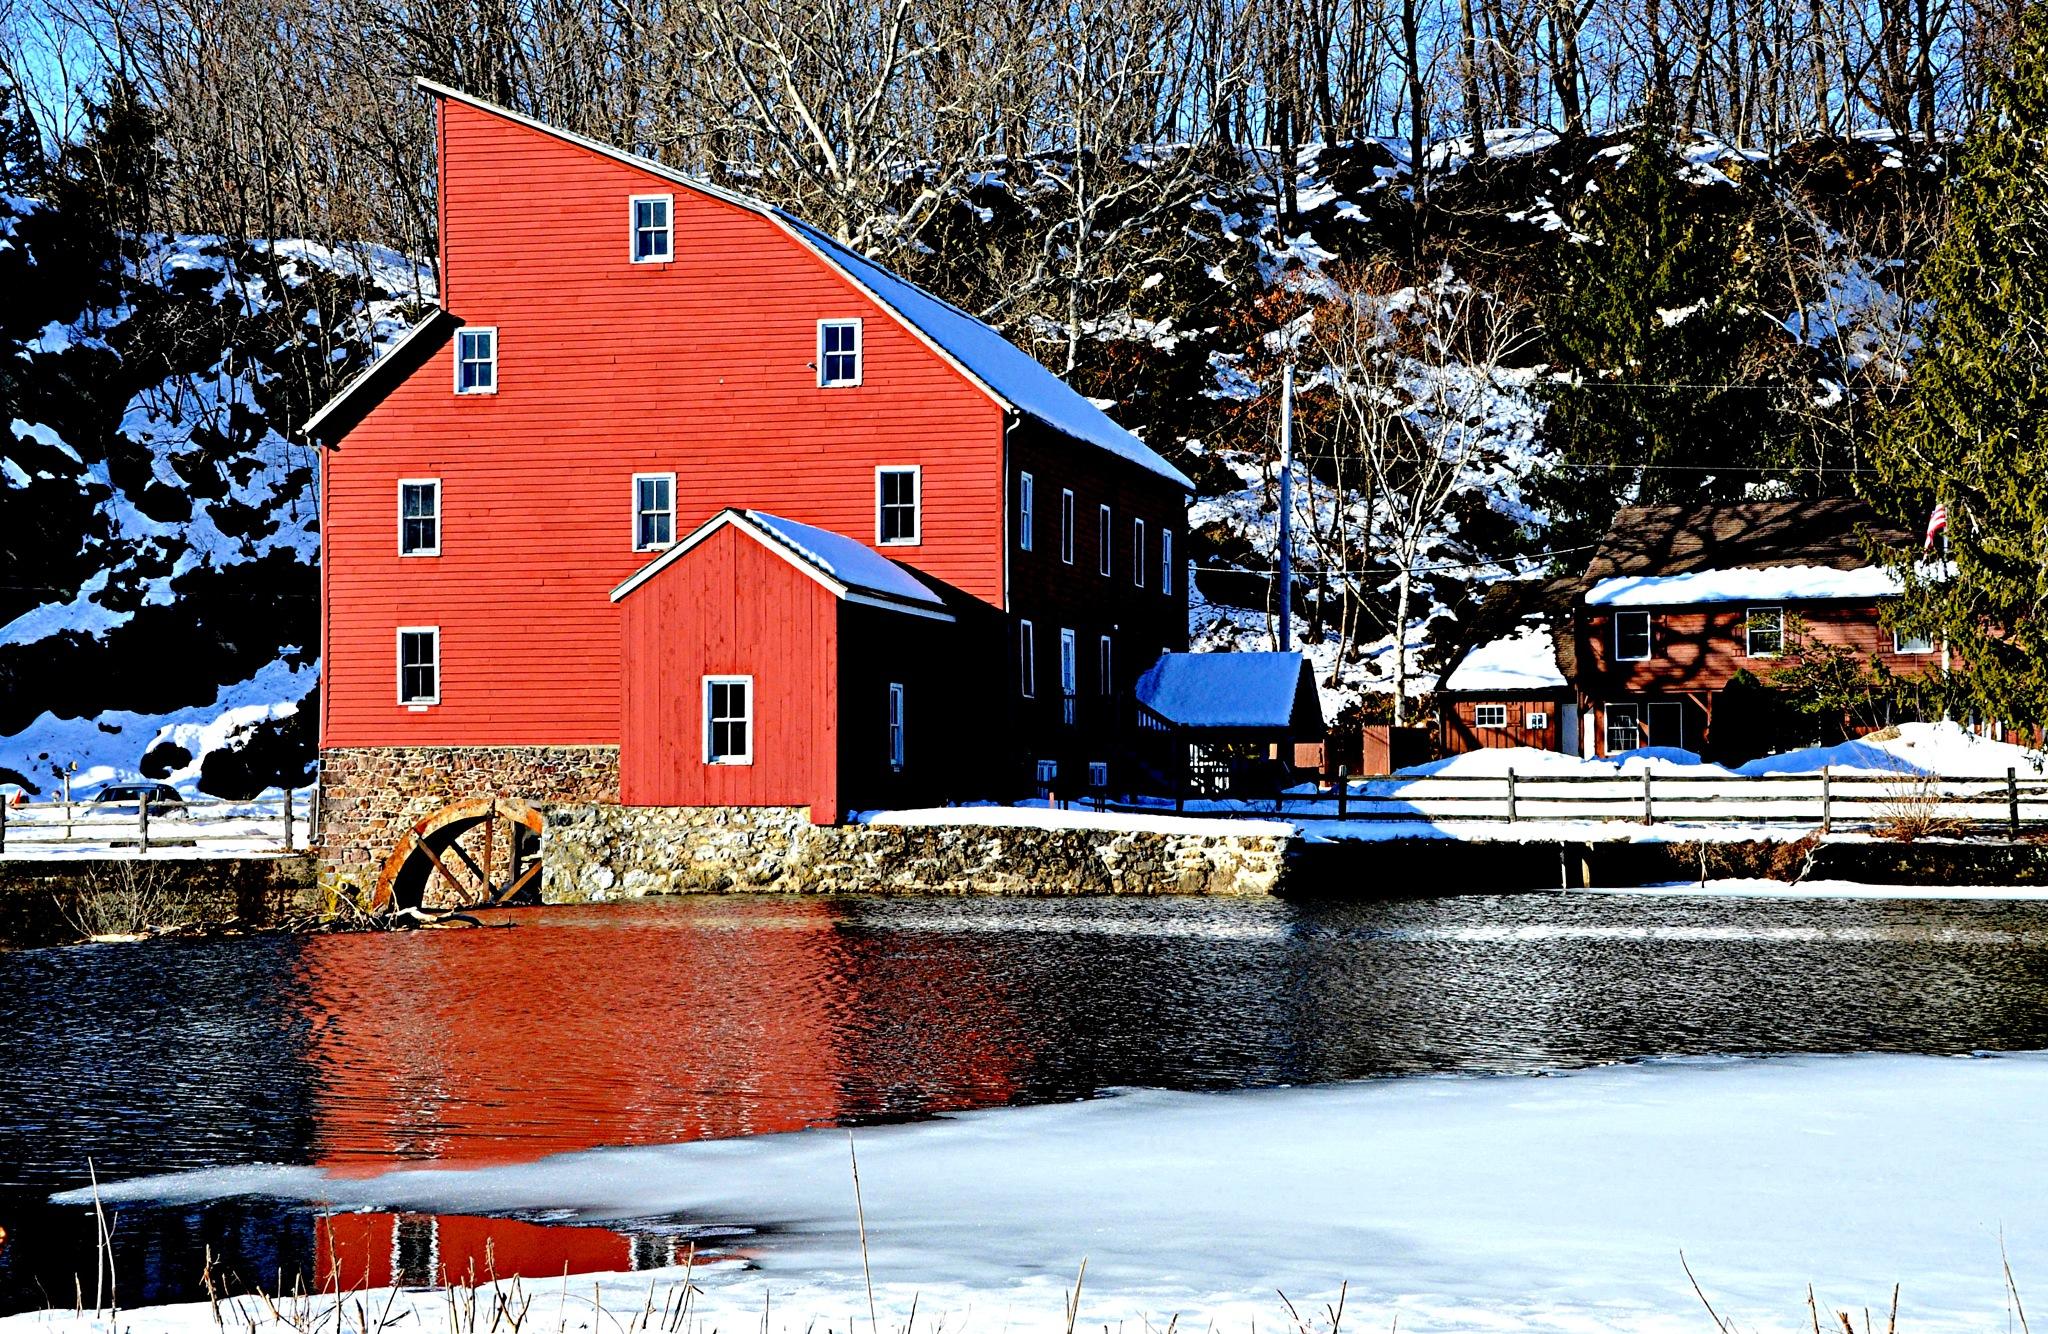 Winter Reflection by Joeski